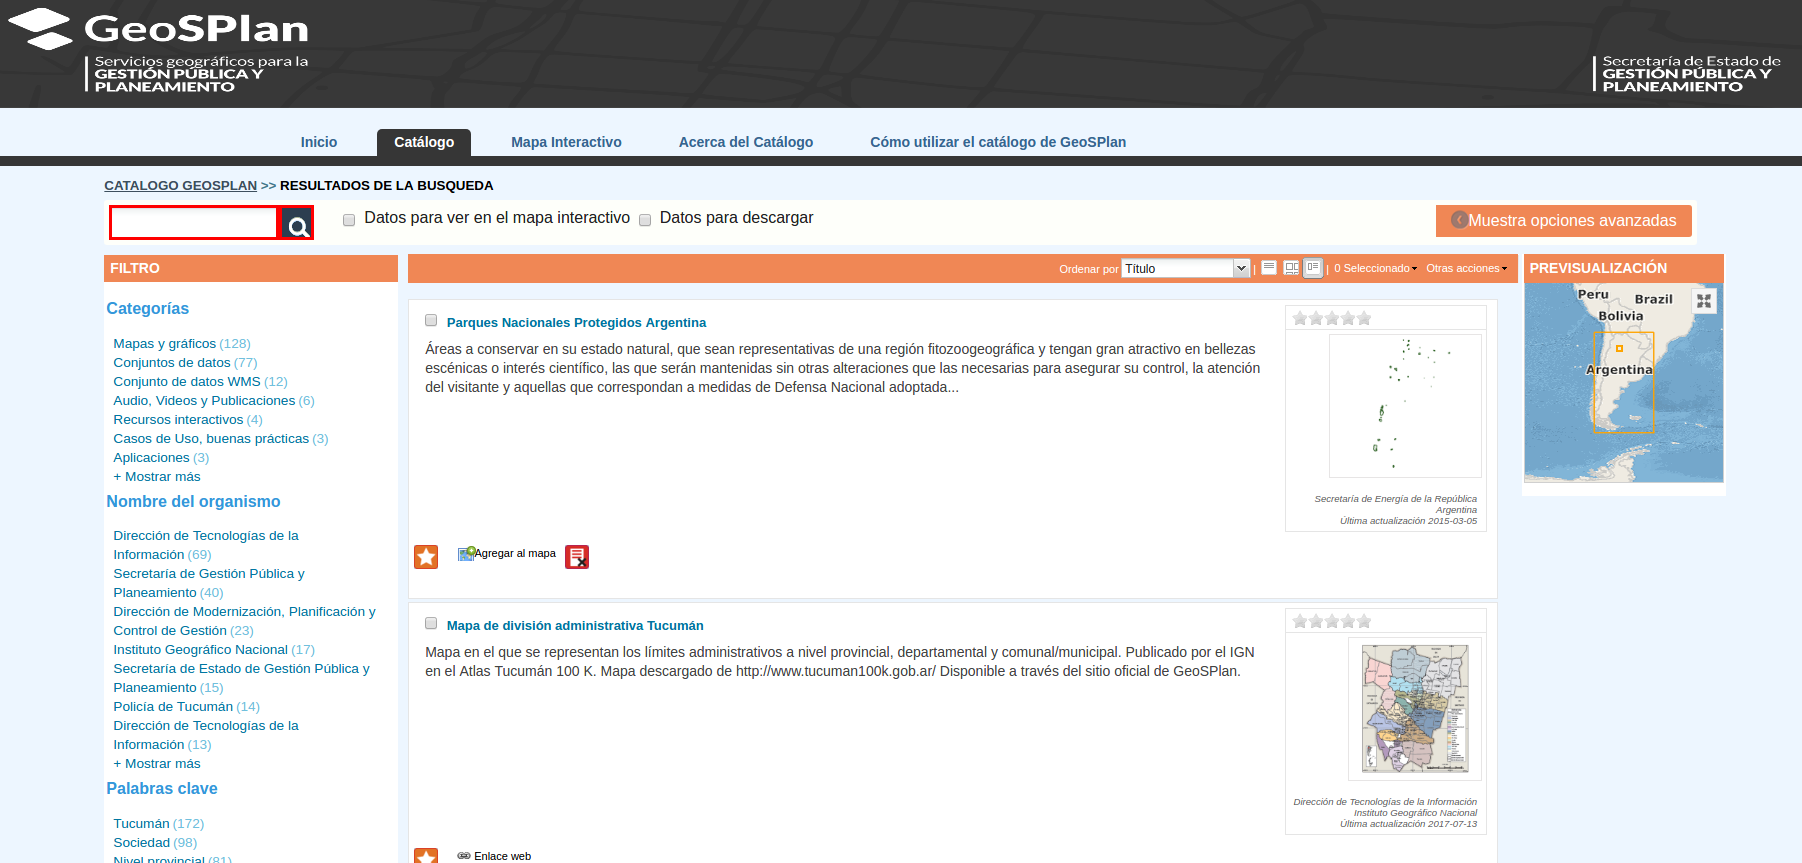 Catalogo de metadatos GeoSPLan